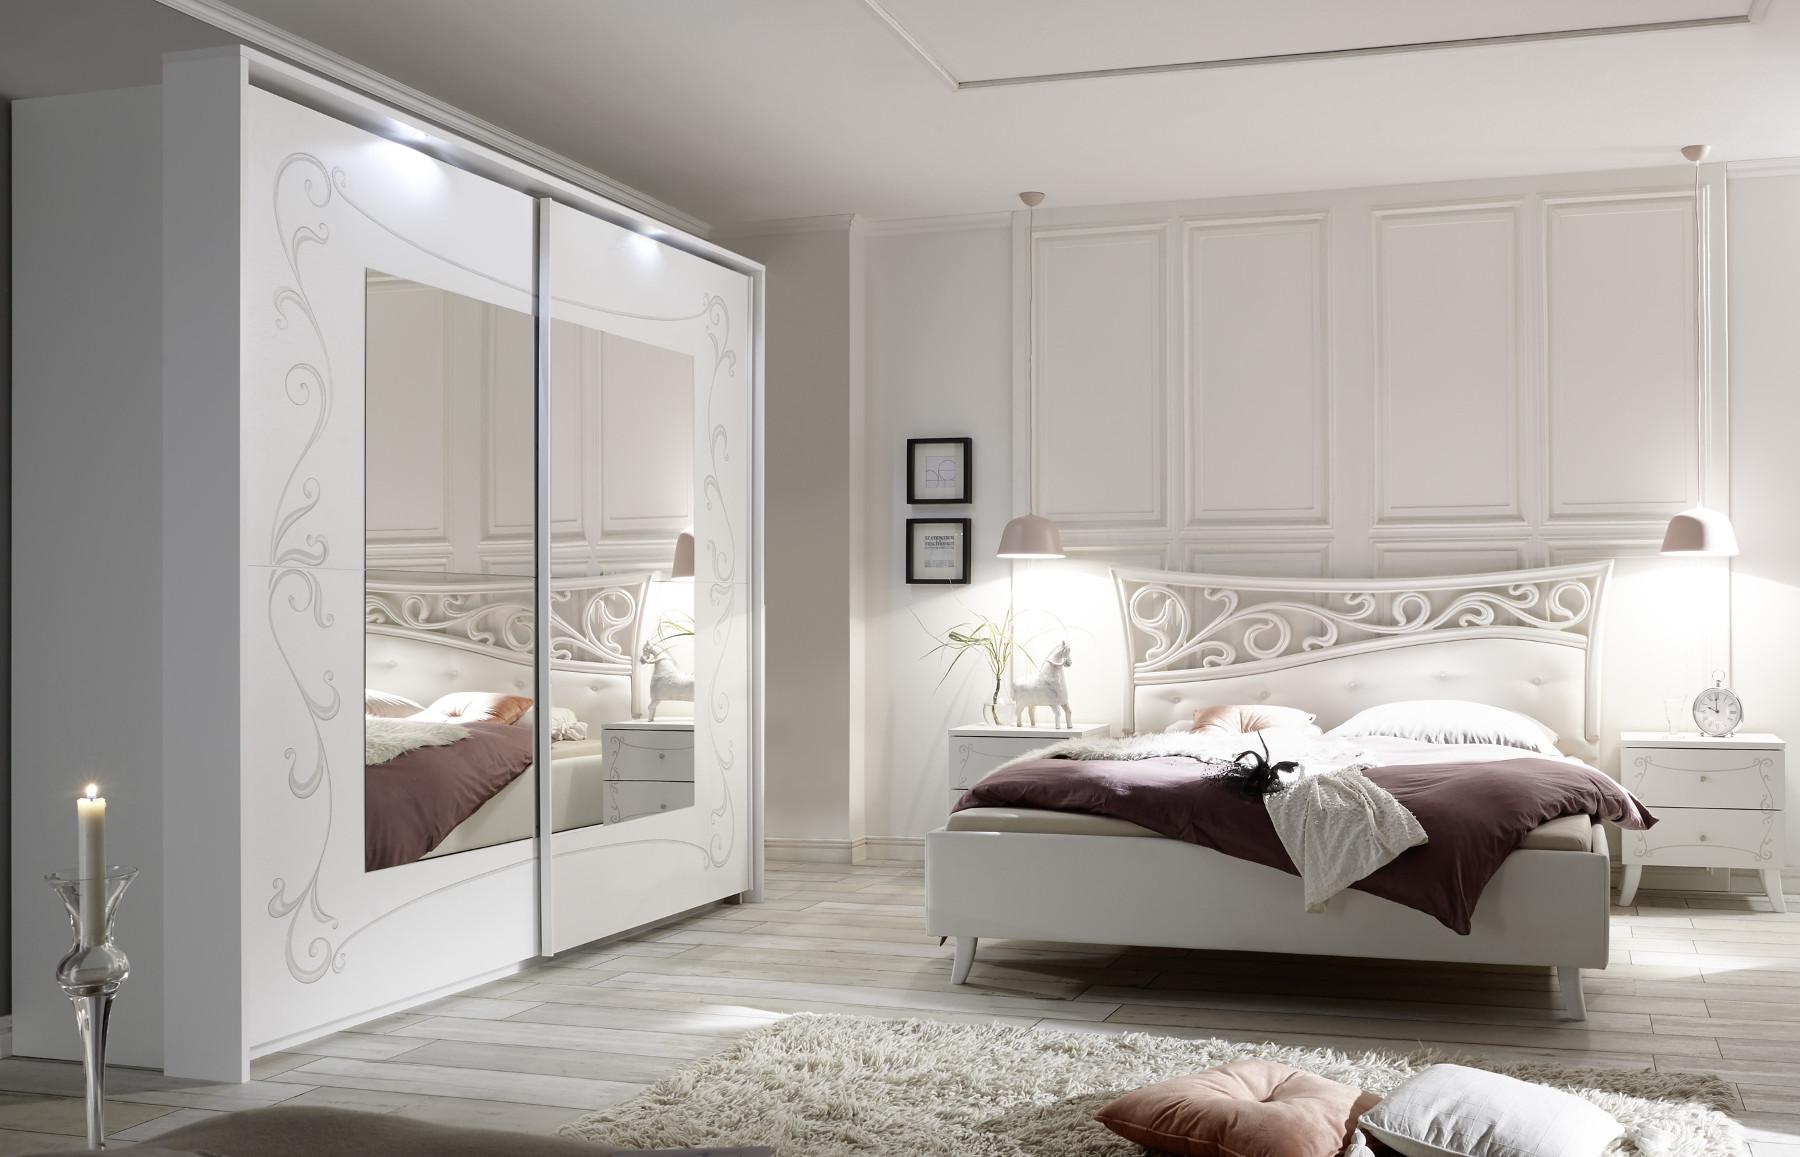 Full Size of Schlafzimmer Komplett Modern Weiss Luxus Massiv Set Komplettset Siebdruck Selvio1 Designermbel Lampe Bett Kronleuchter Landhausstil Wohnzimmer Modernes 180x200 Wohnzimmer Schlafzimmer Komplett Modern